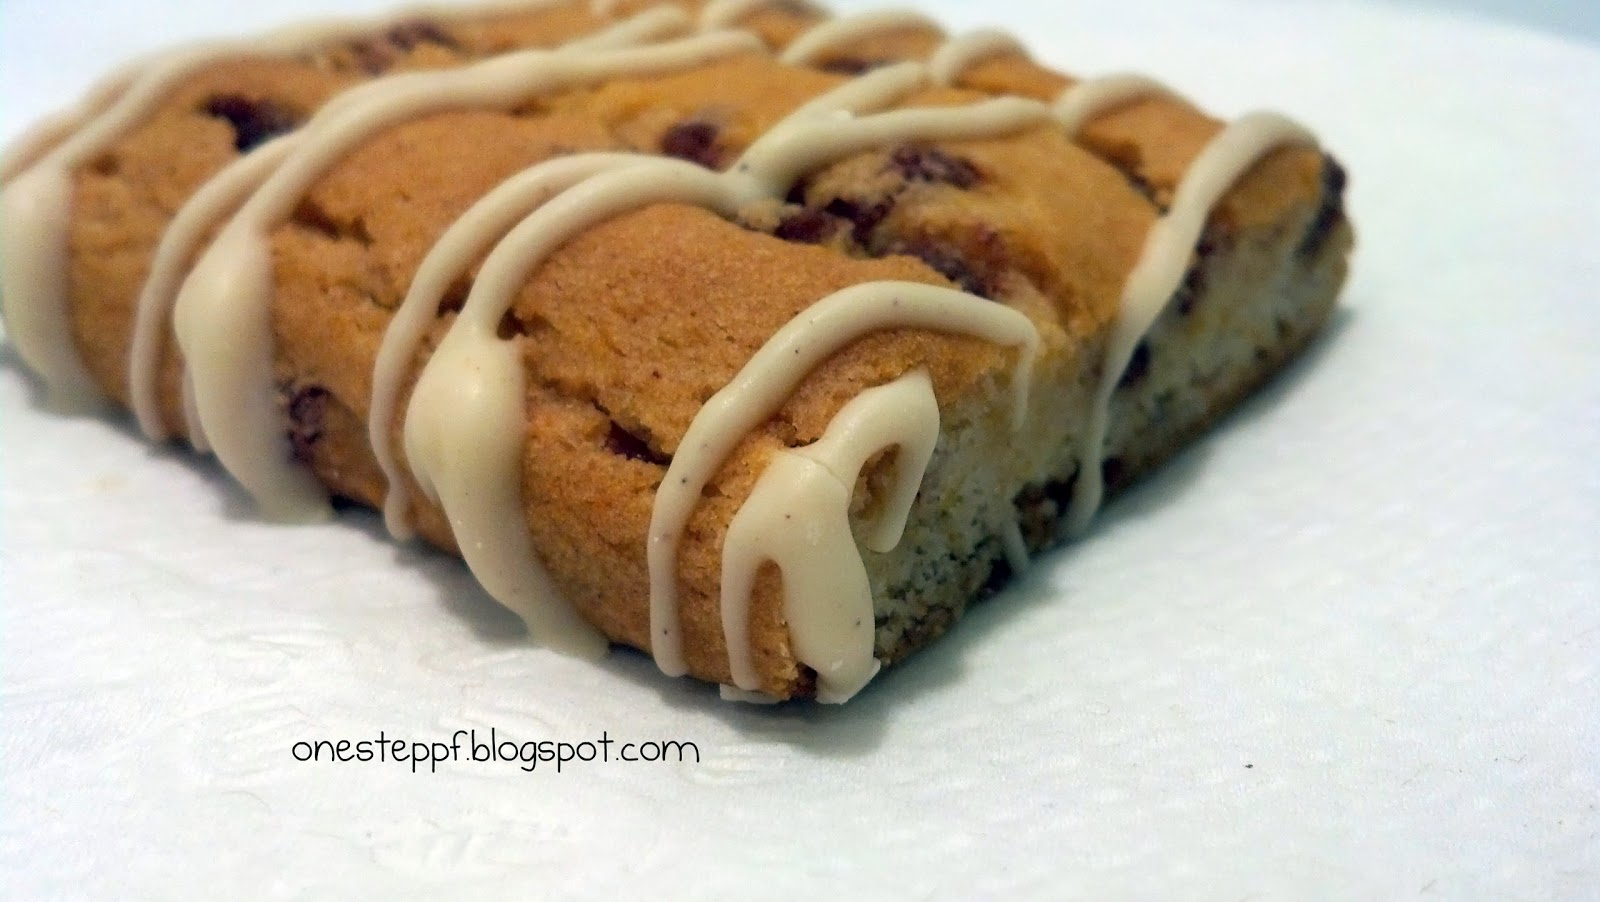 Fiber One Cinnamon Coffee Cake Review